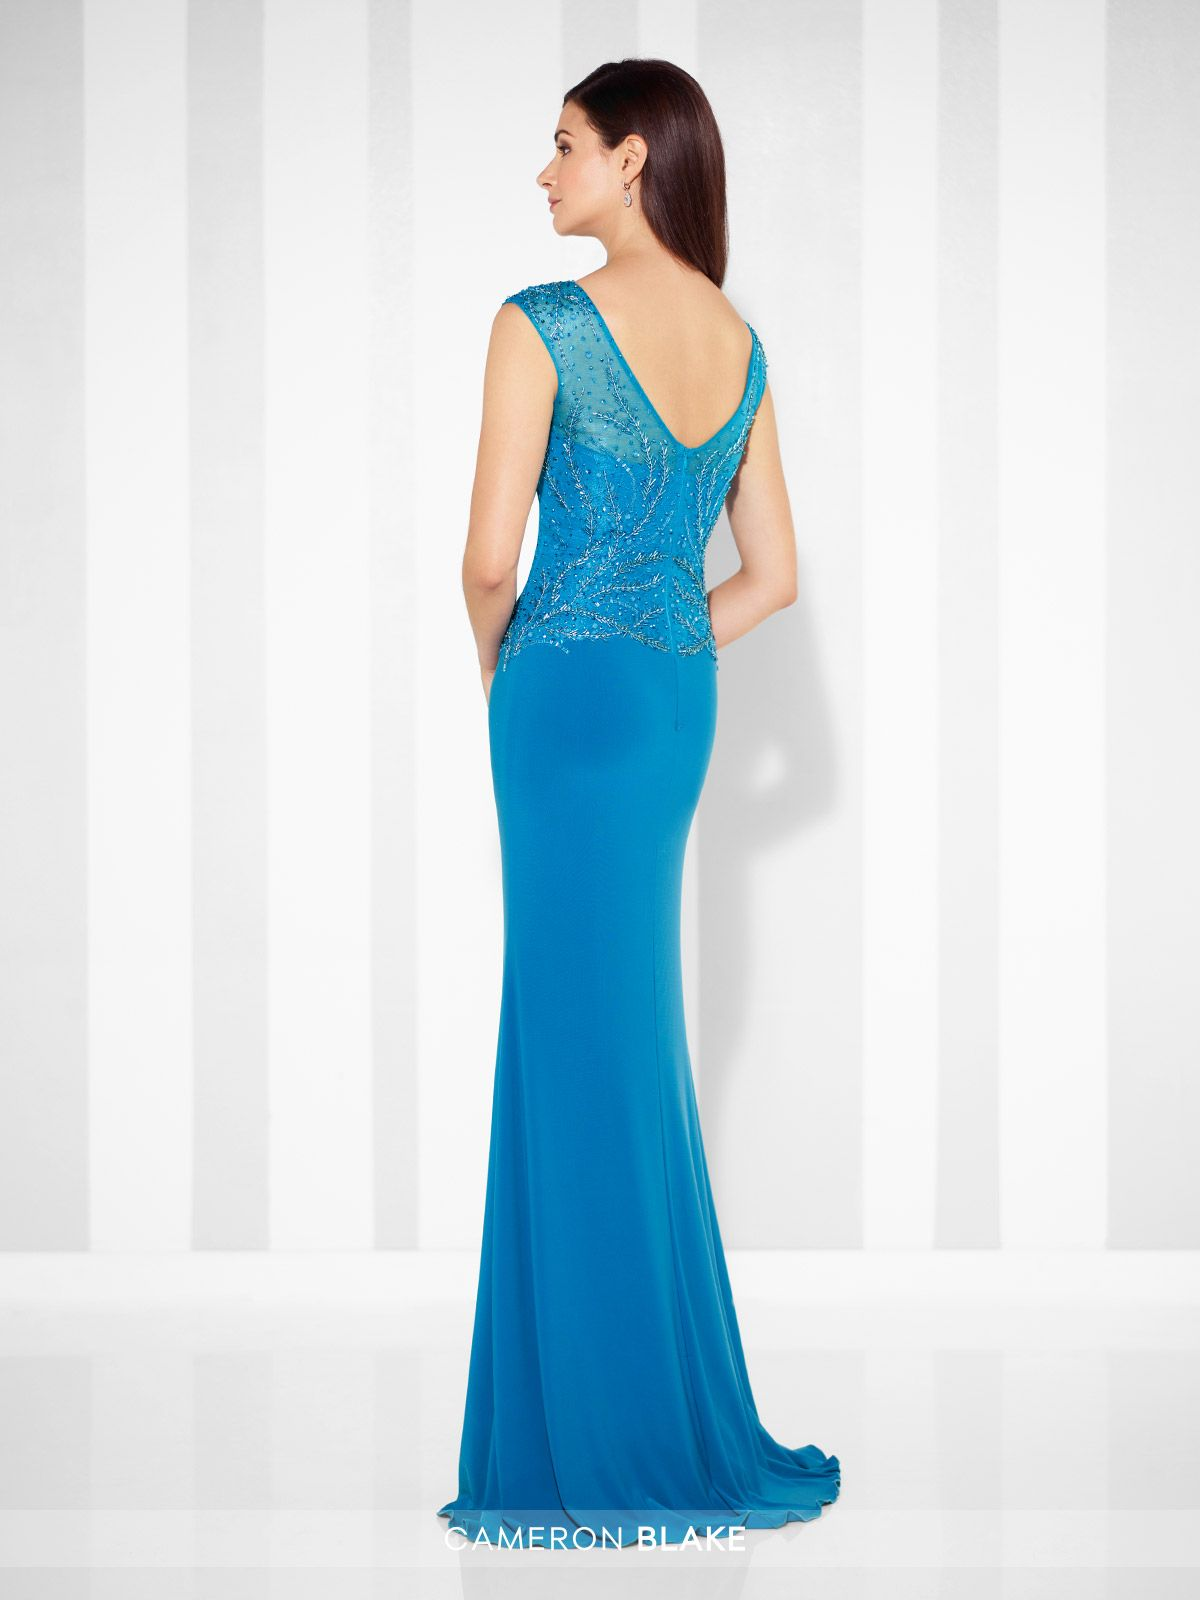 Cameron Blake - Evening Dresses - 117605   Vestidos fiestas ...